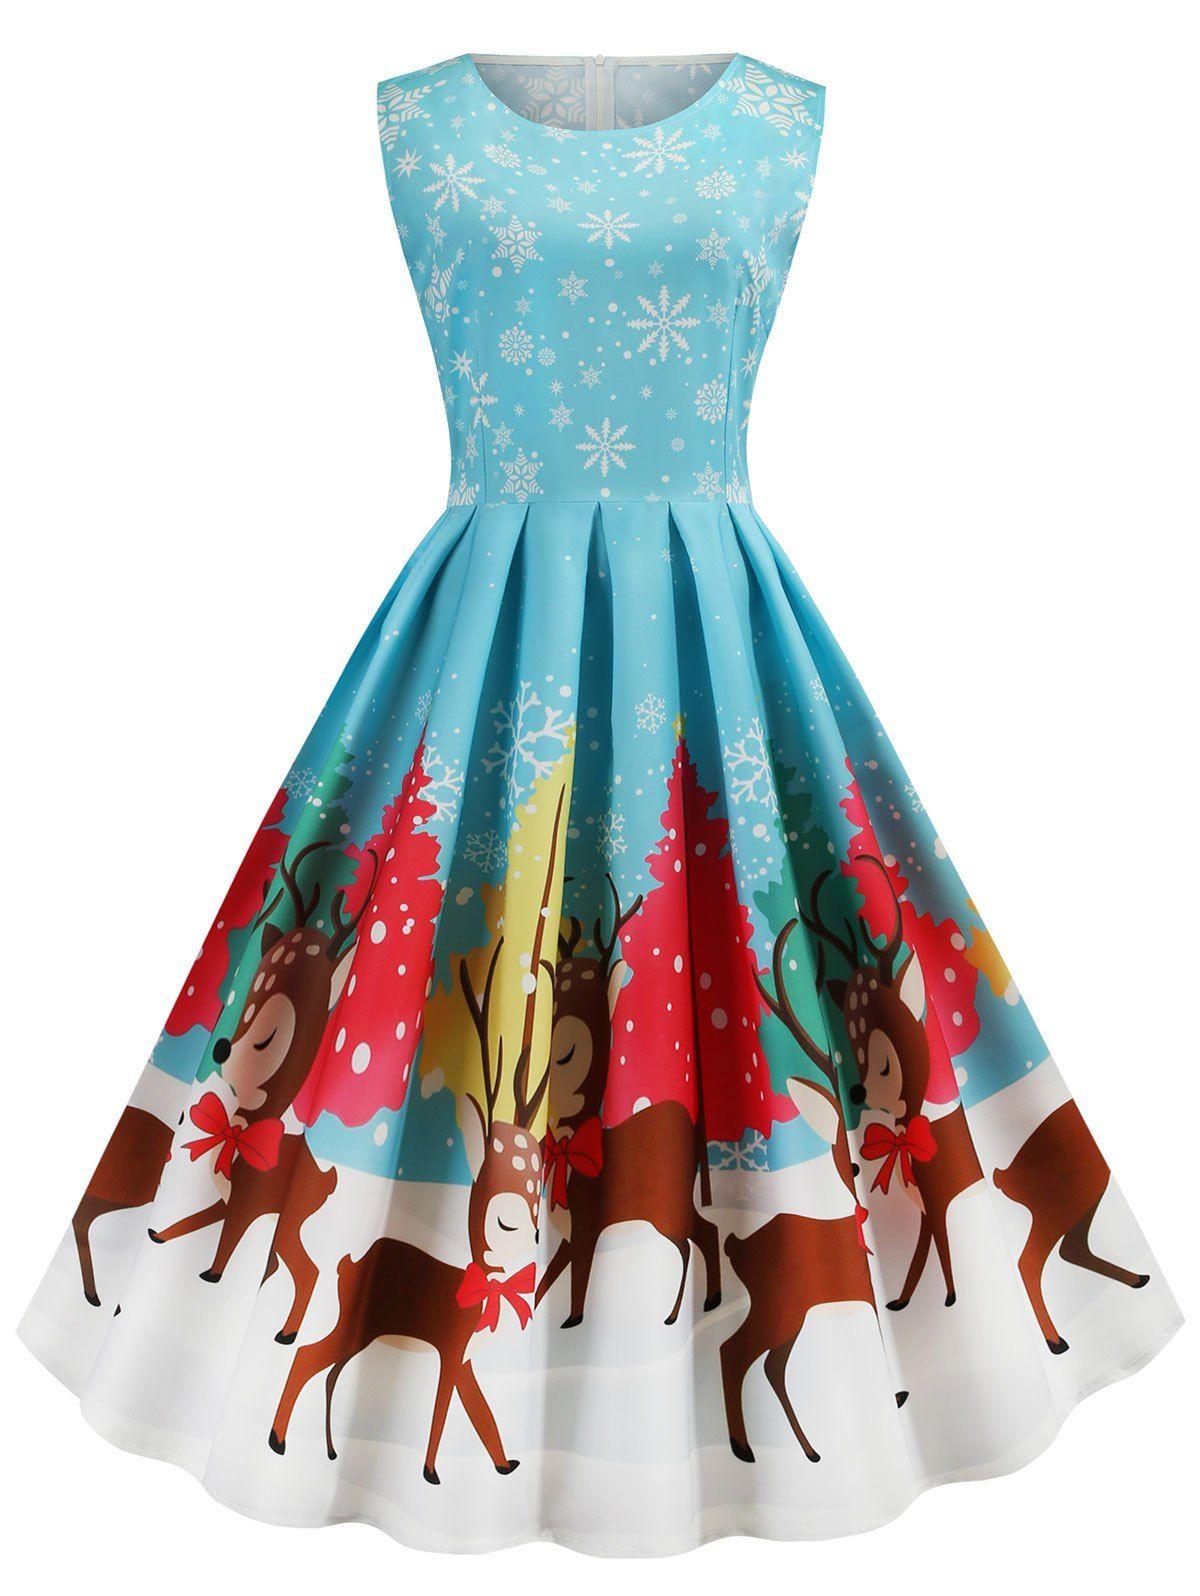 Plus Size Vintage Christmas Print Swing Dress Vintage Dresses Casual Vintage 1950s Dresses Casual Christmas Dresses [ 1596 x 1200 Pixel ]